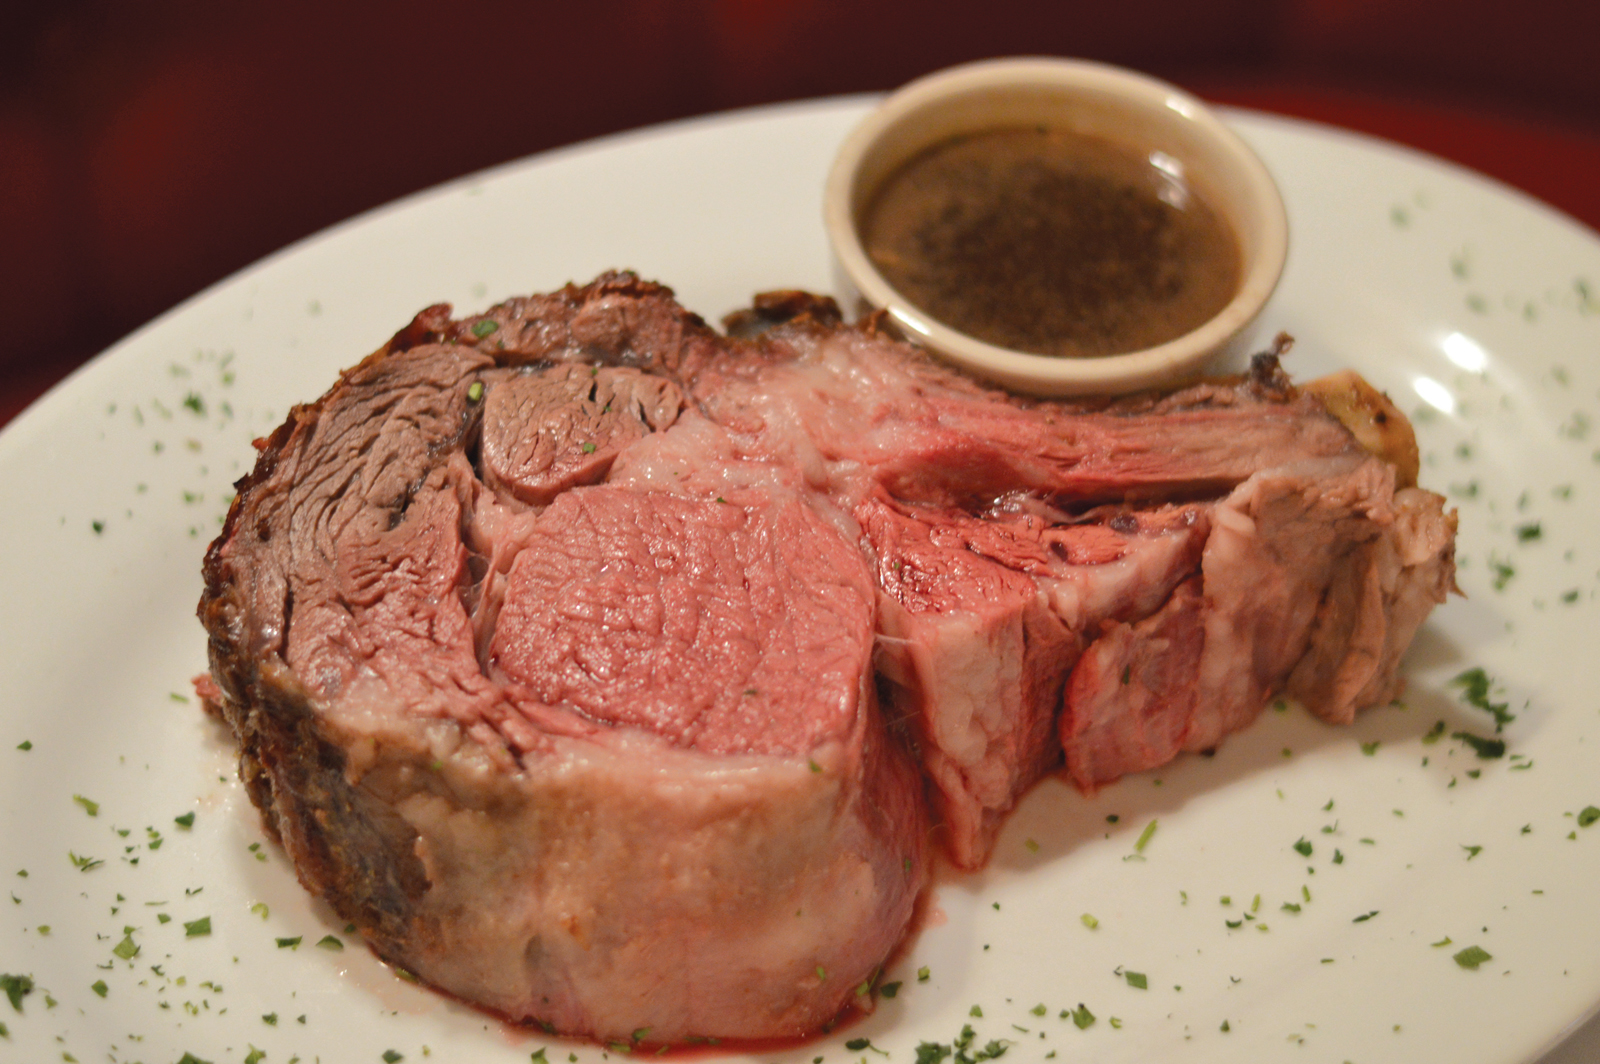 Roasted Prime Rib of Beef